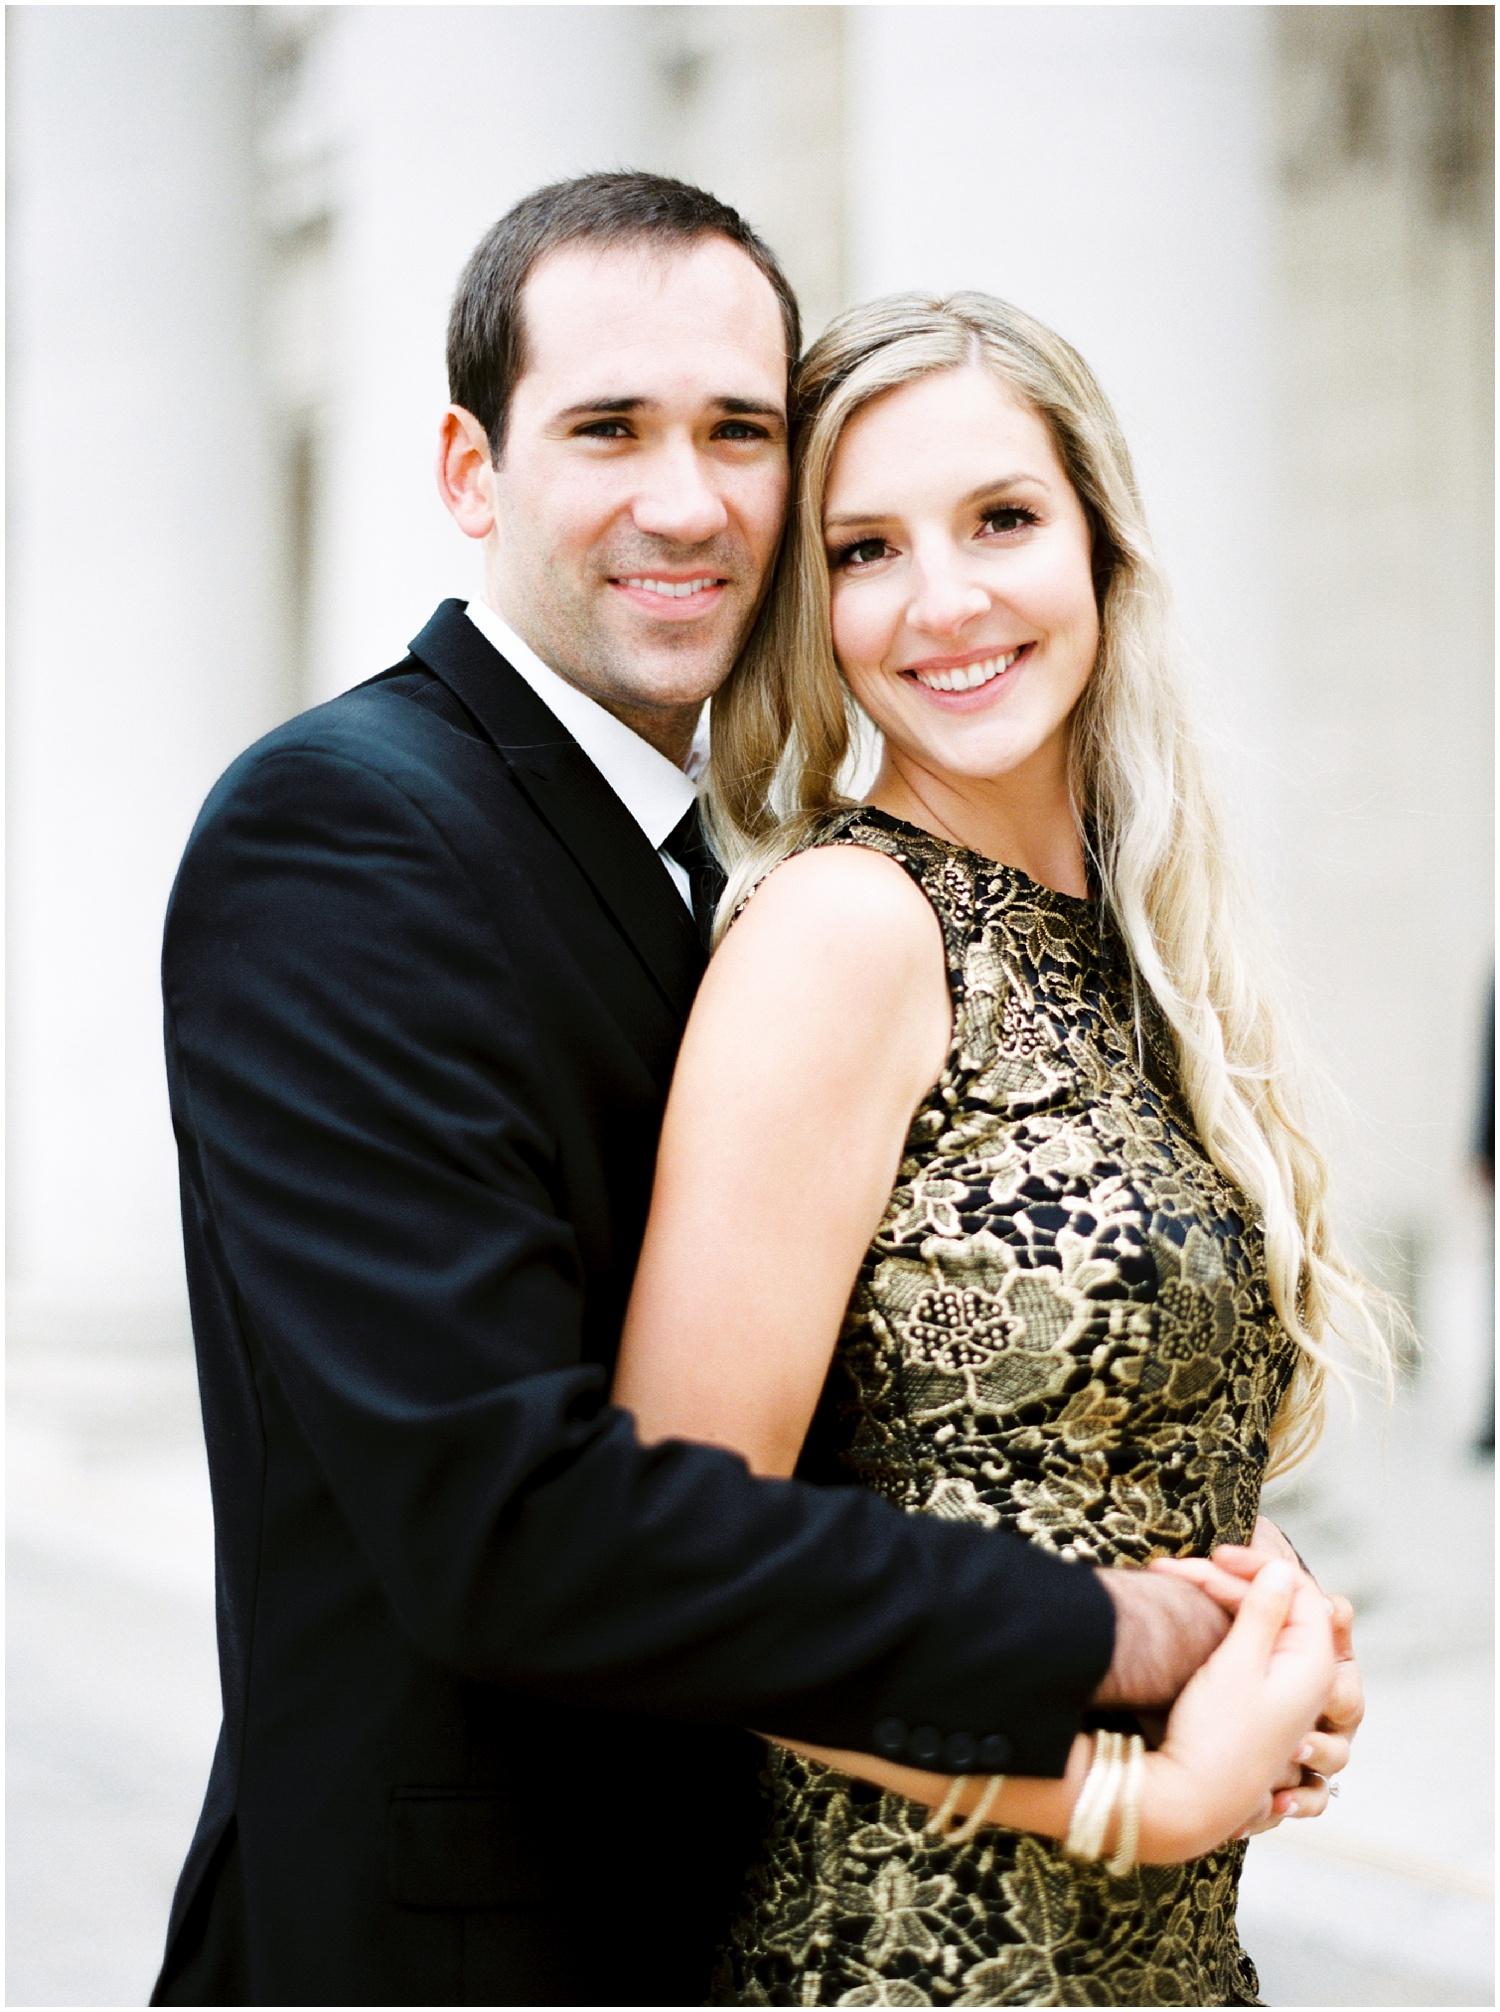 Legion of Honor Photography, San Francisco Engagement Photography, Baker Beach Photography, Fresno Wedding photographers, San Francisco Wedding photographers, Fine art film photographer